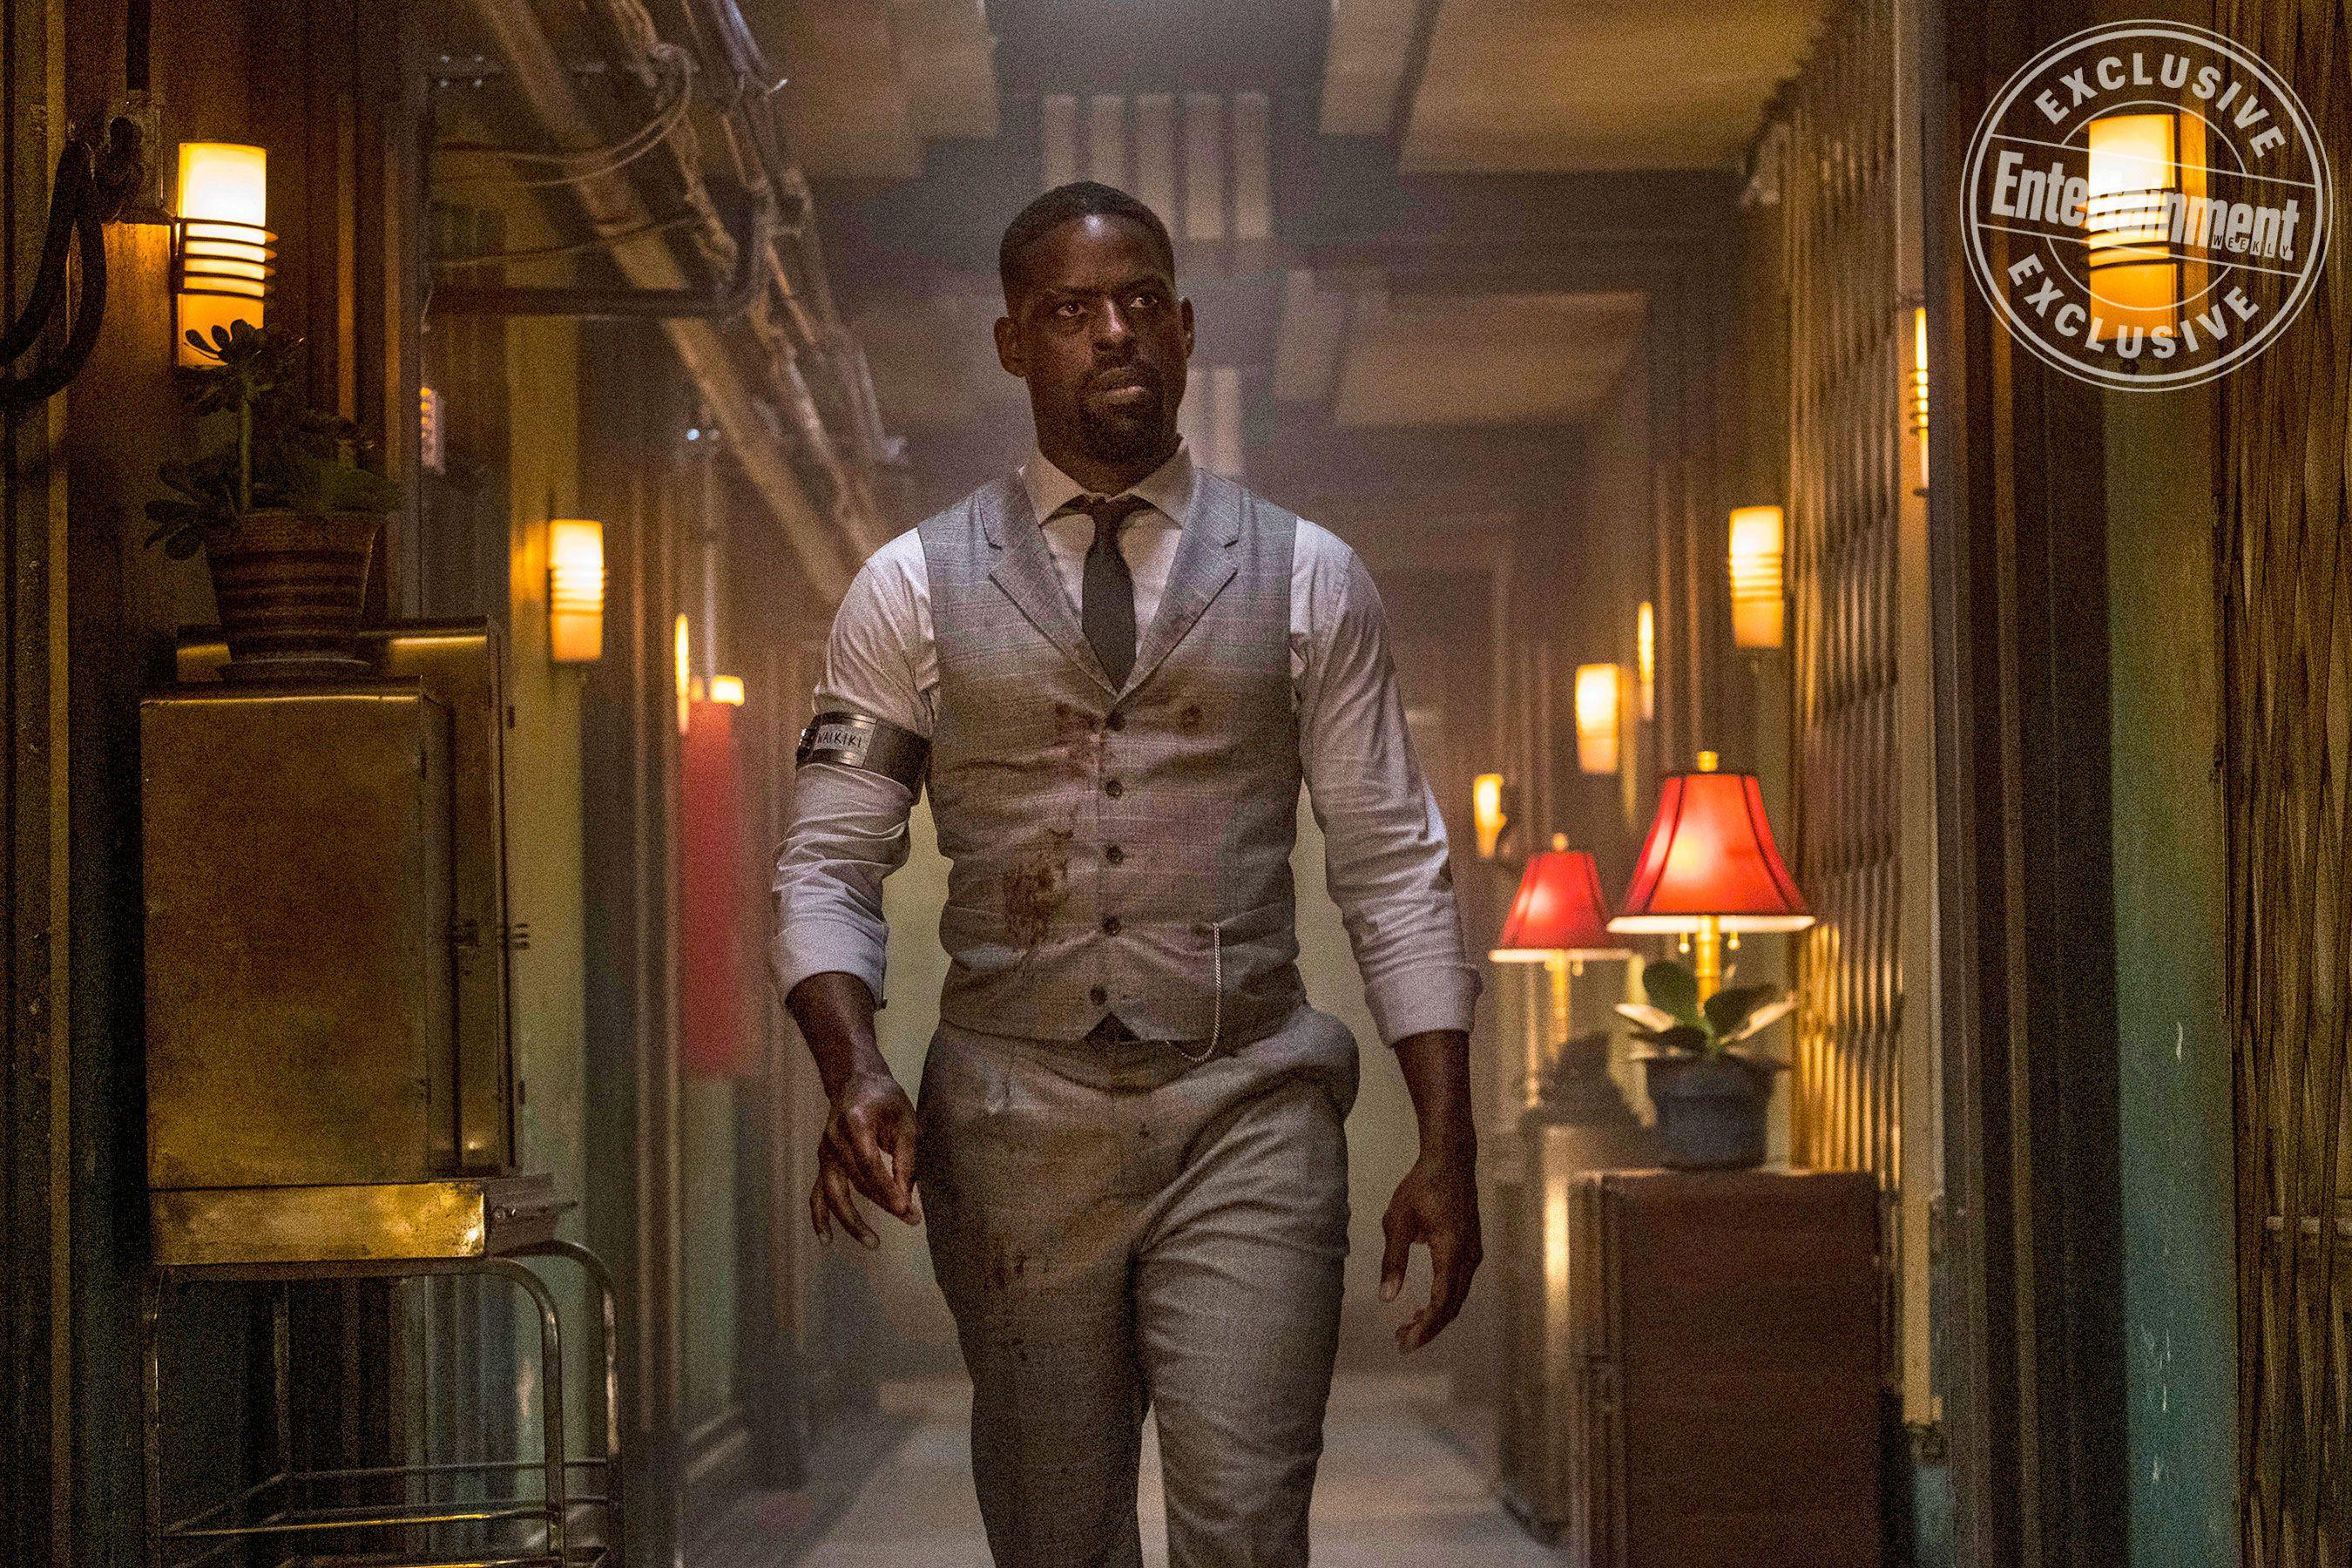 Hotel Artemis Turkce Dublaj Izle Hd Izle 2 2018 Movies Movies